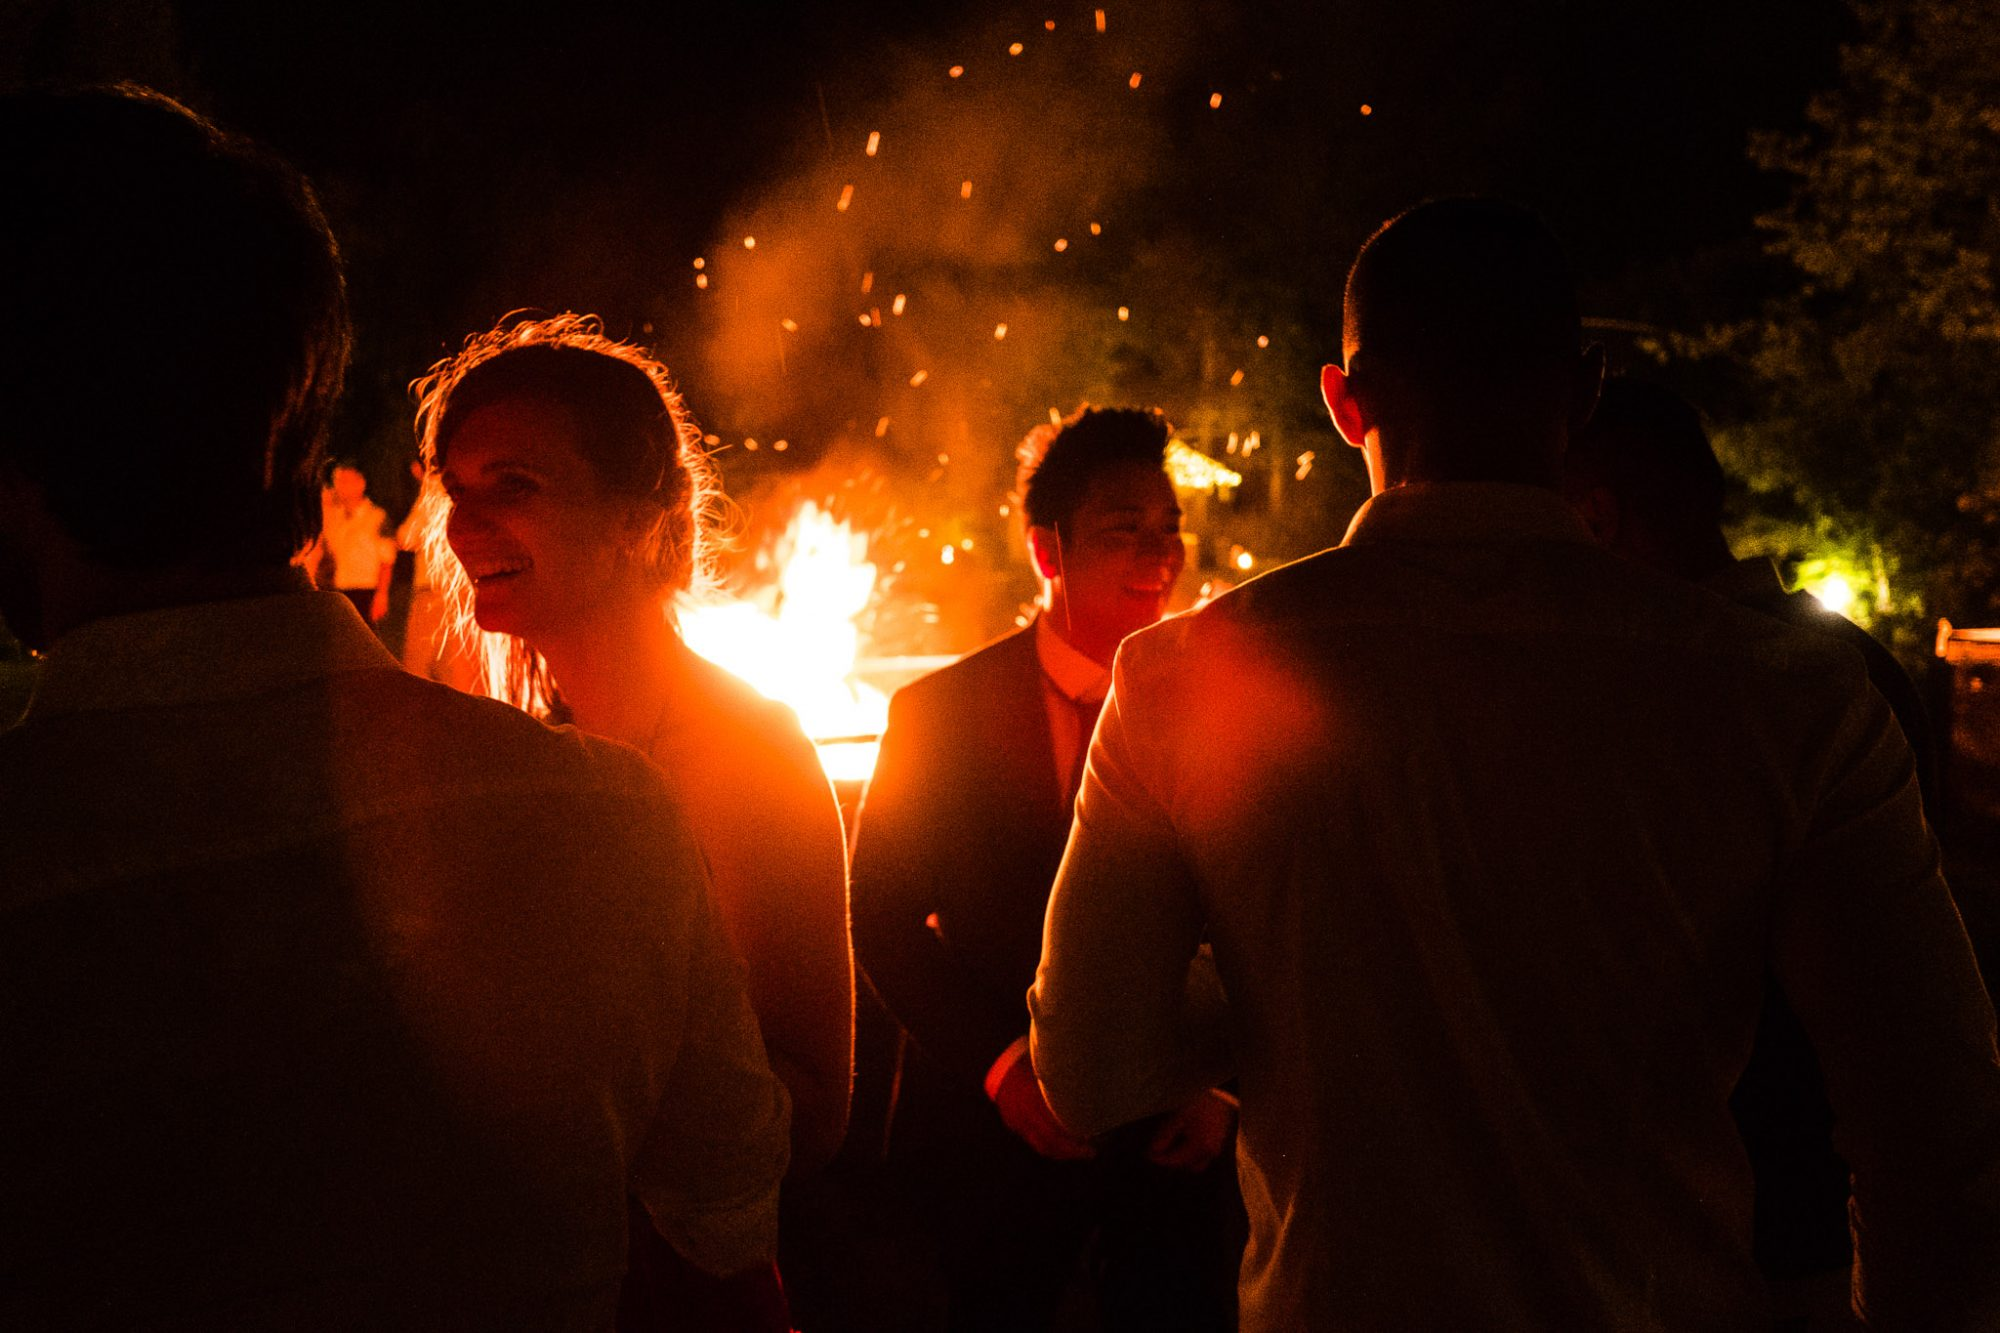 luca rossi notte durante matrimonio reportage fotografico